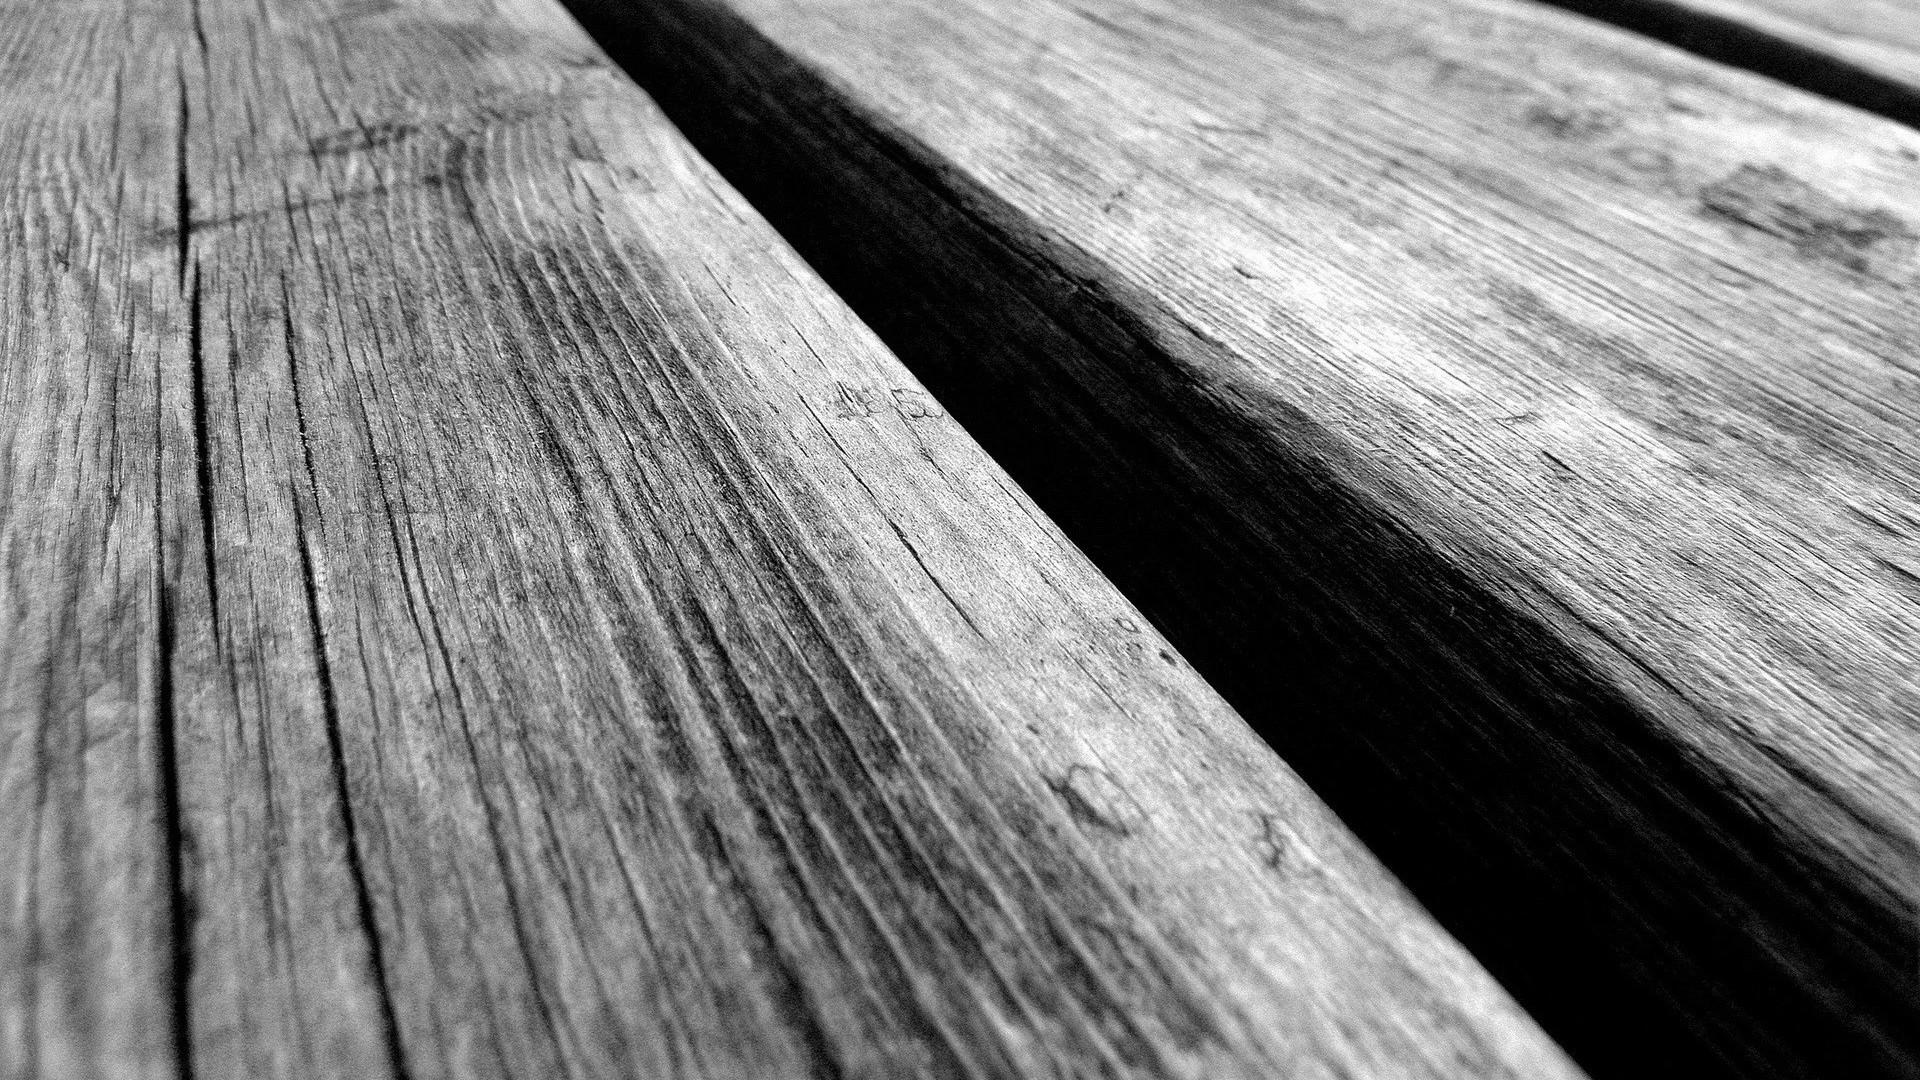 Free-grey-wood-wallpaper-HD.jpg (1920×1080)